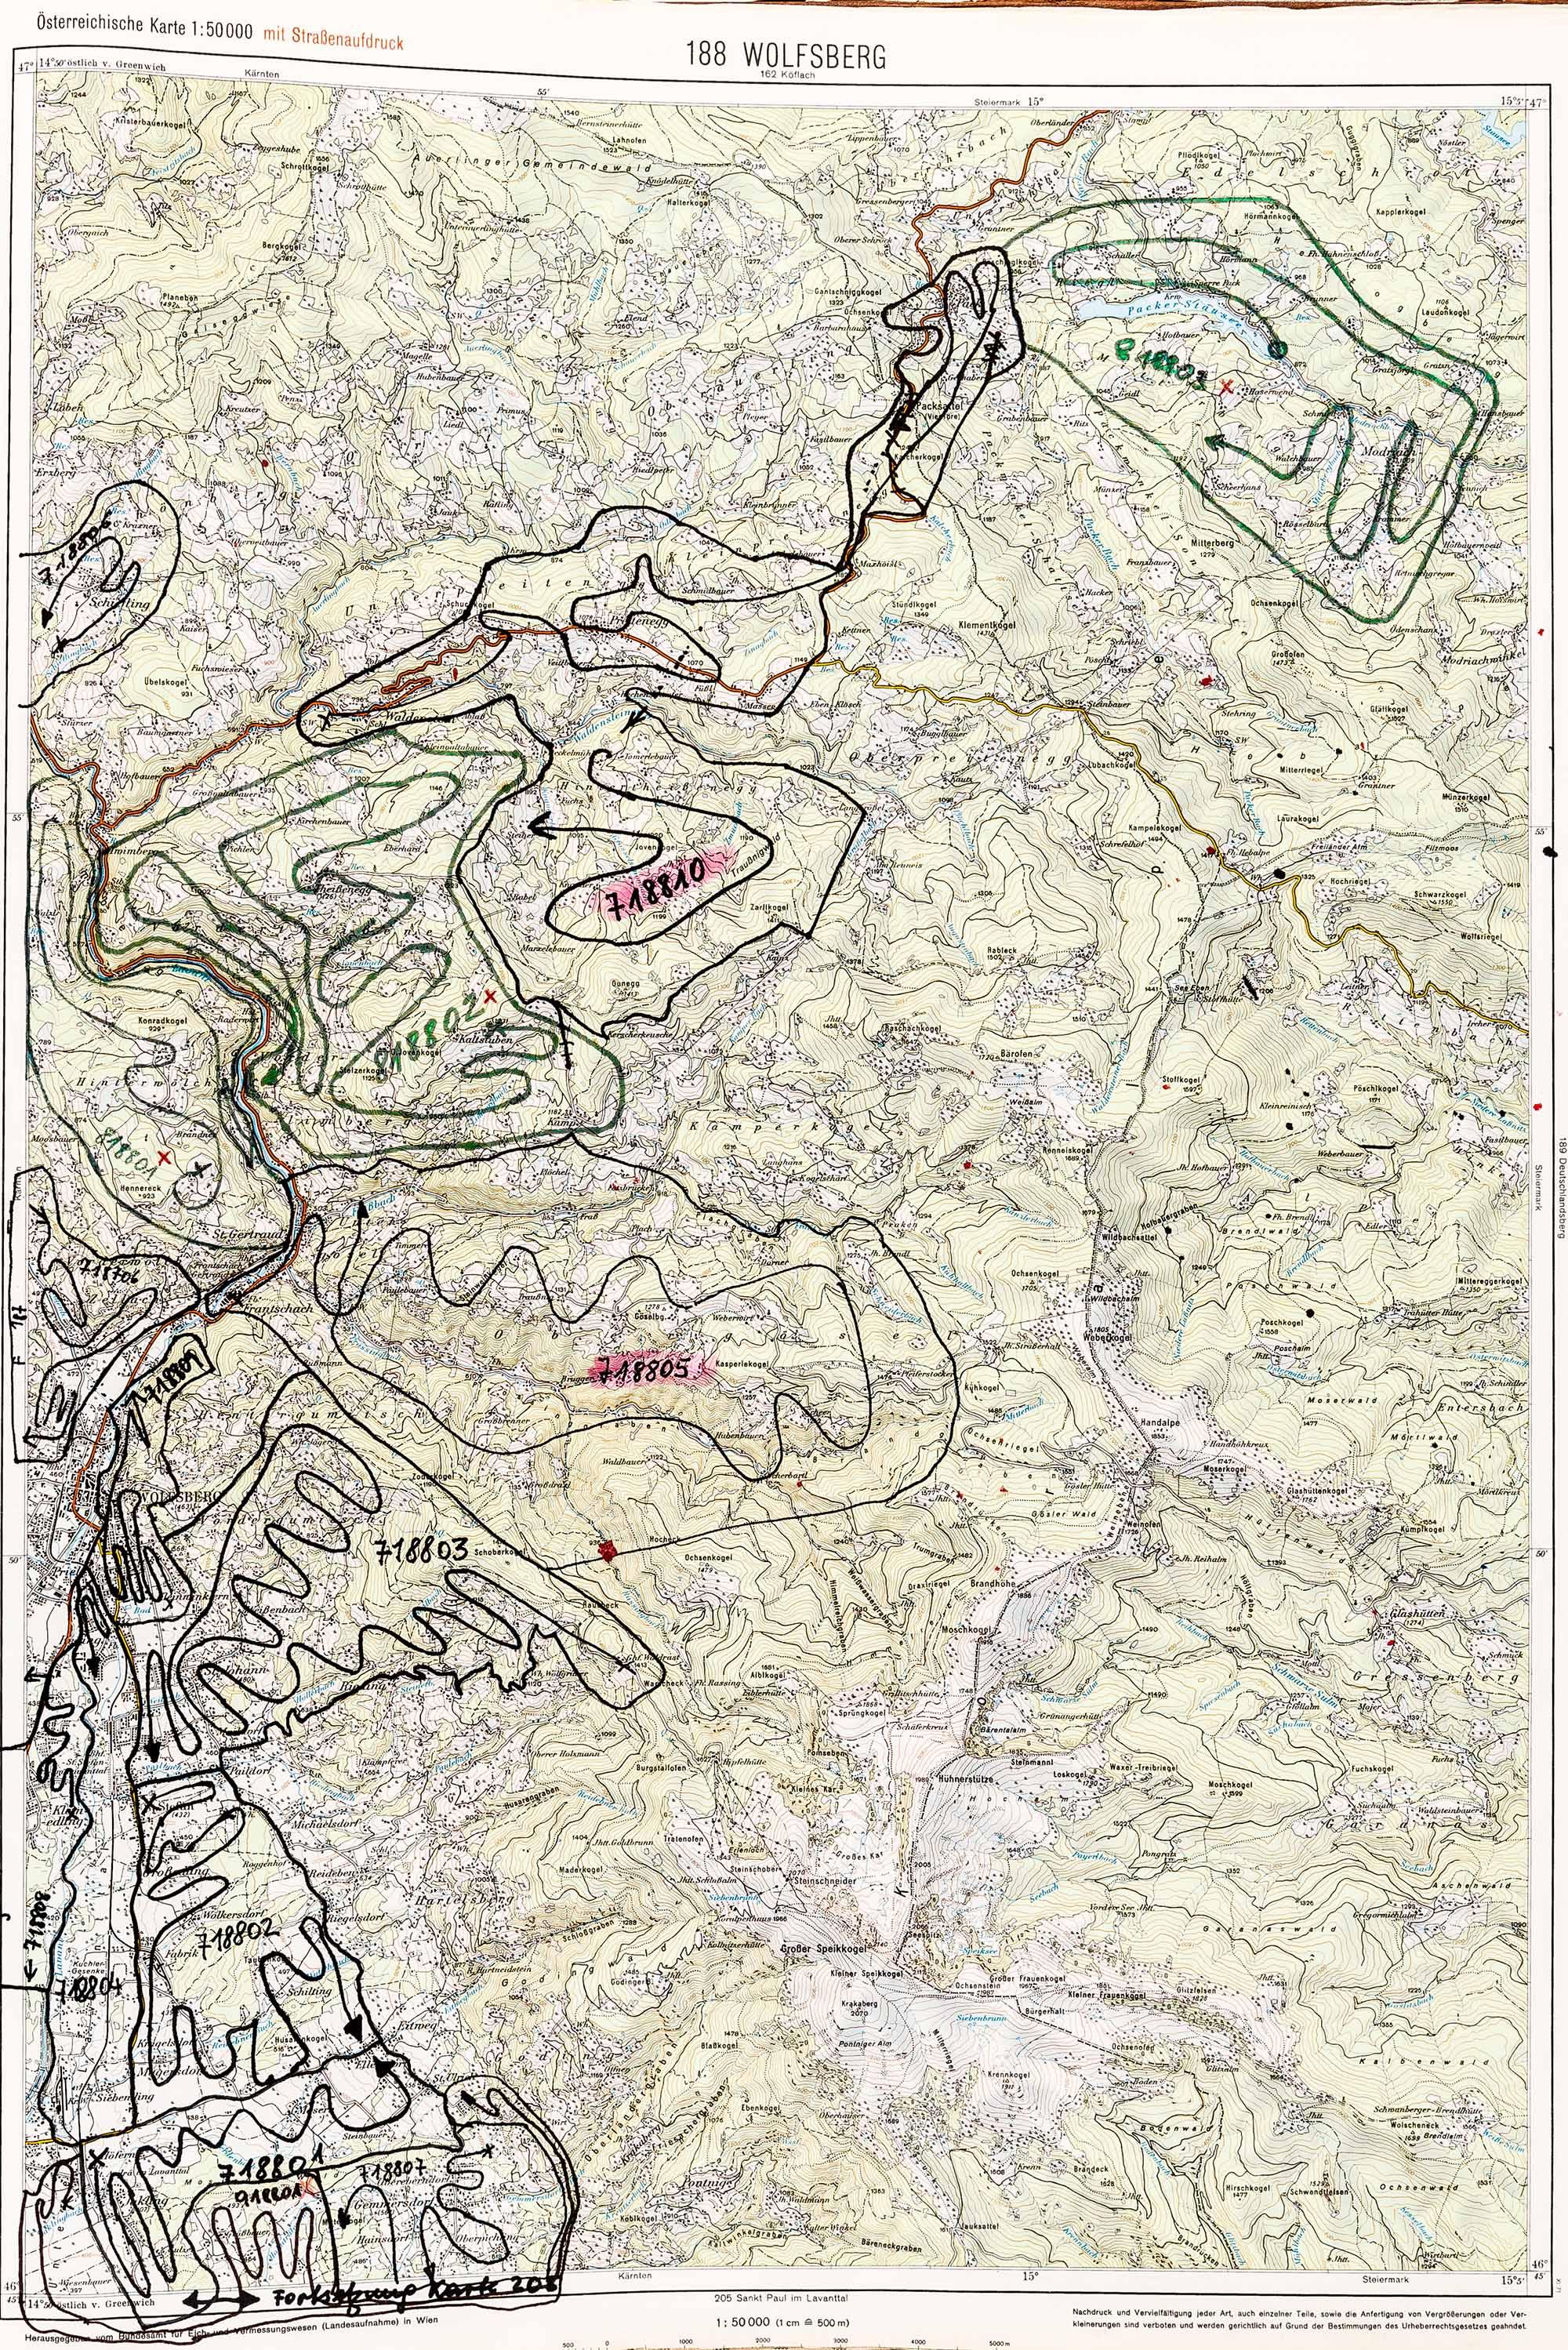 1975-1979 Karte 188